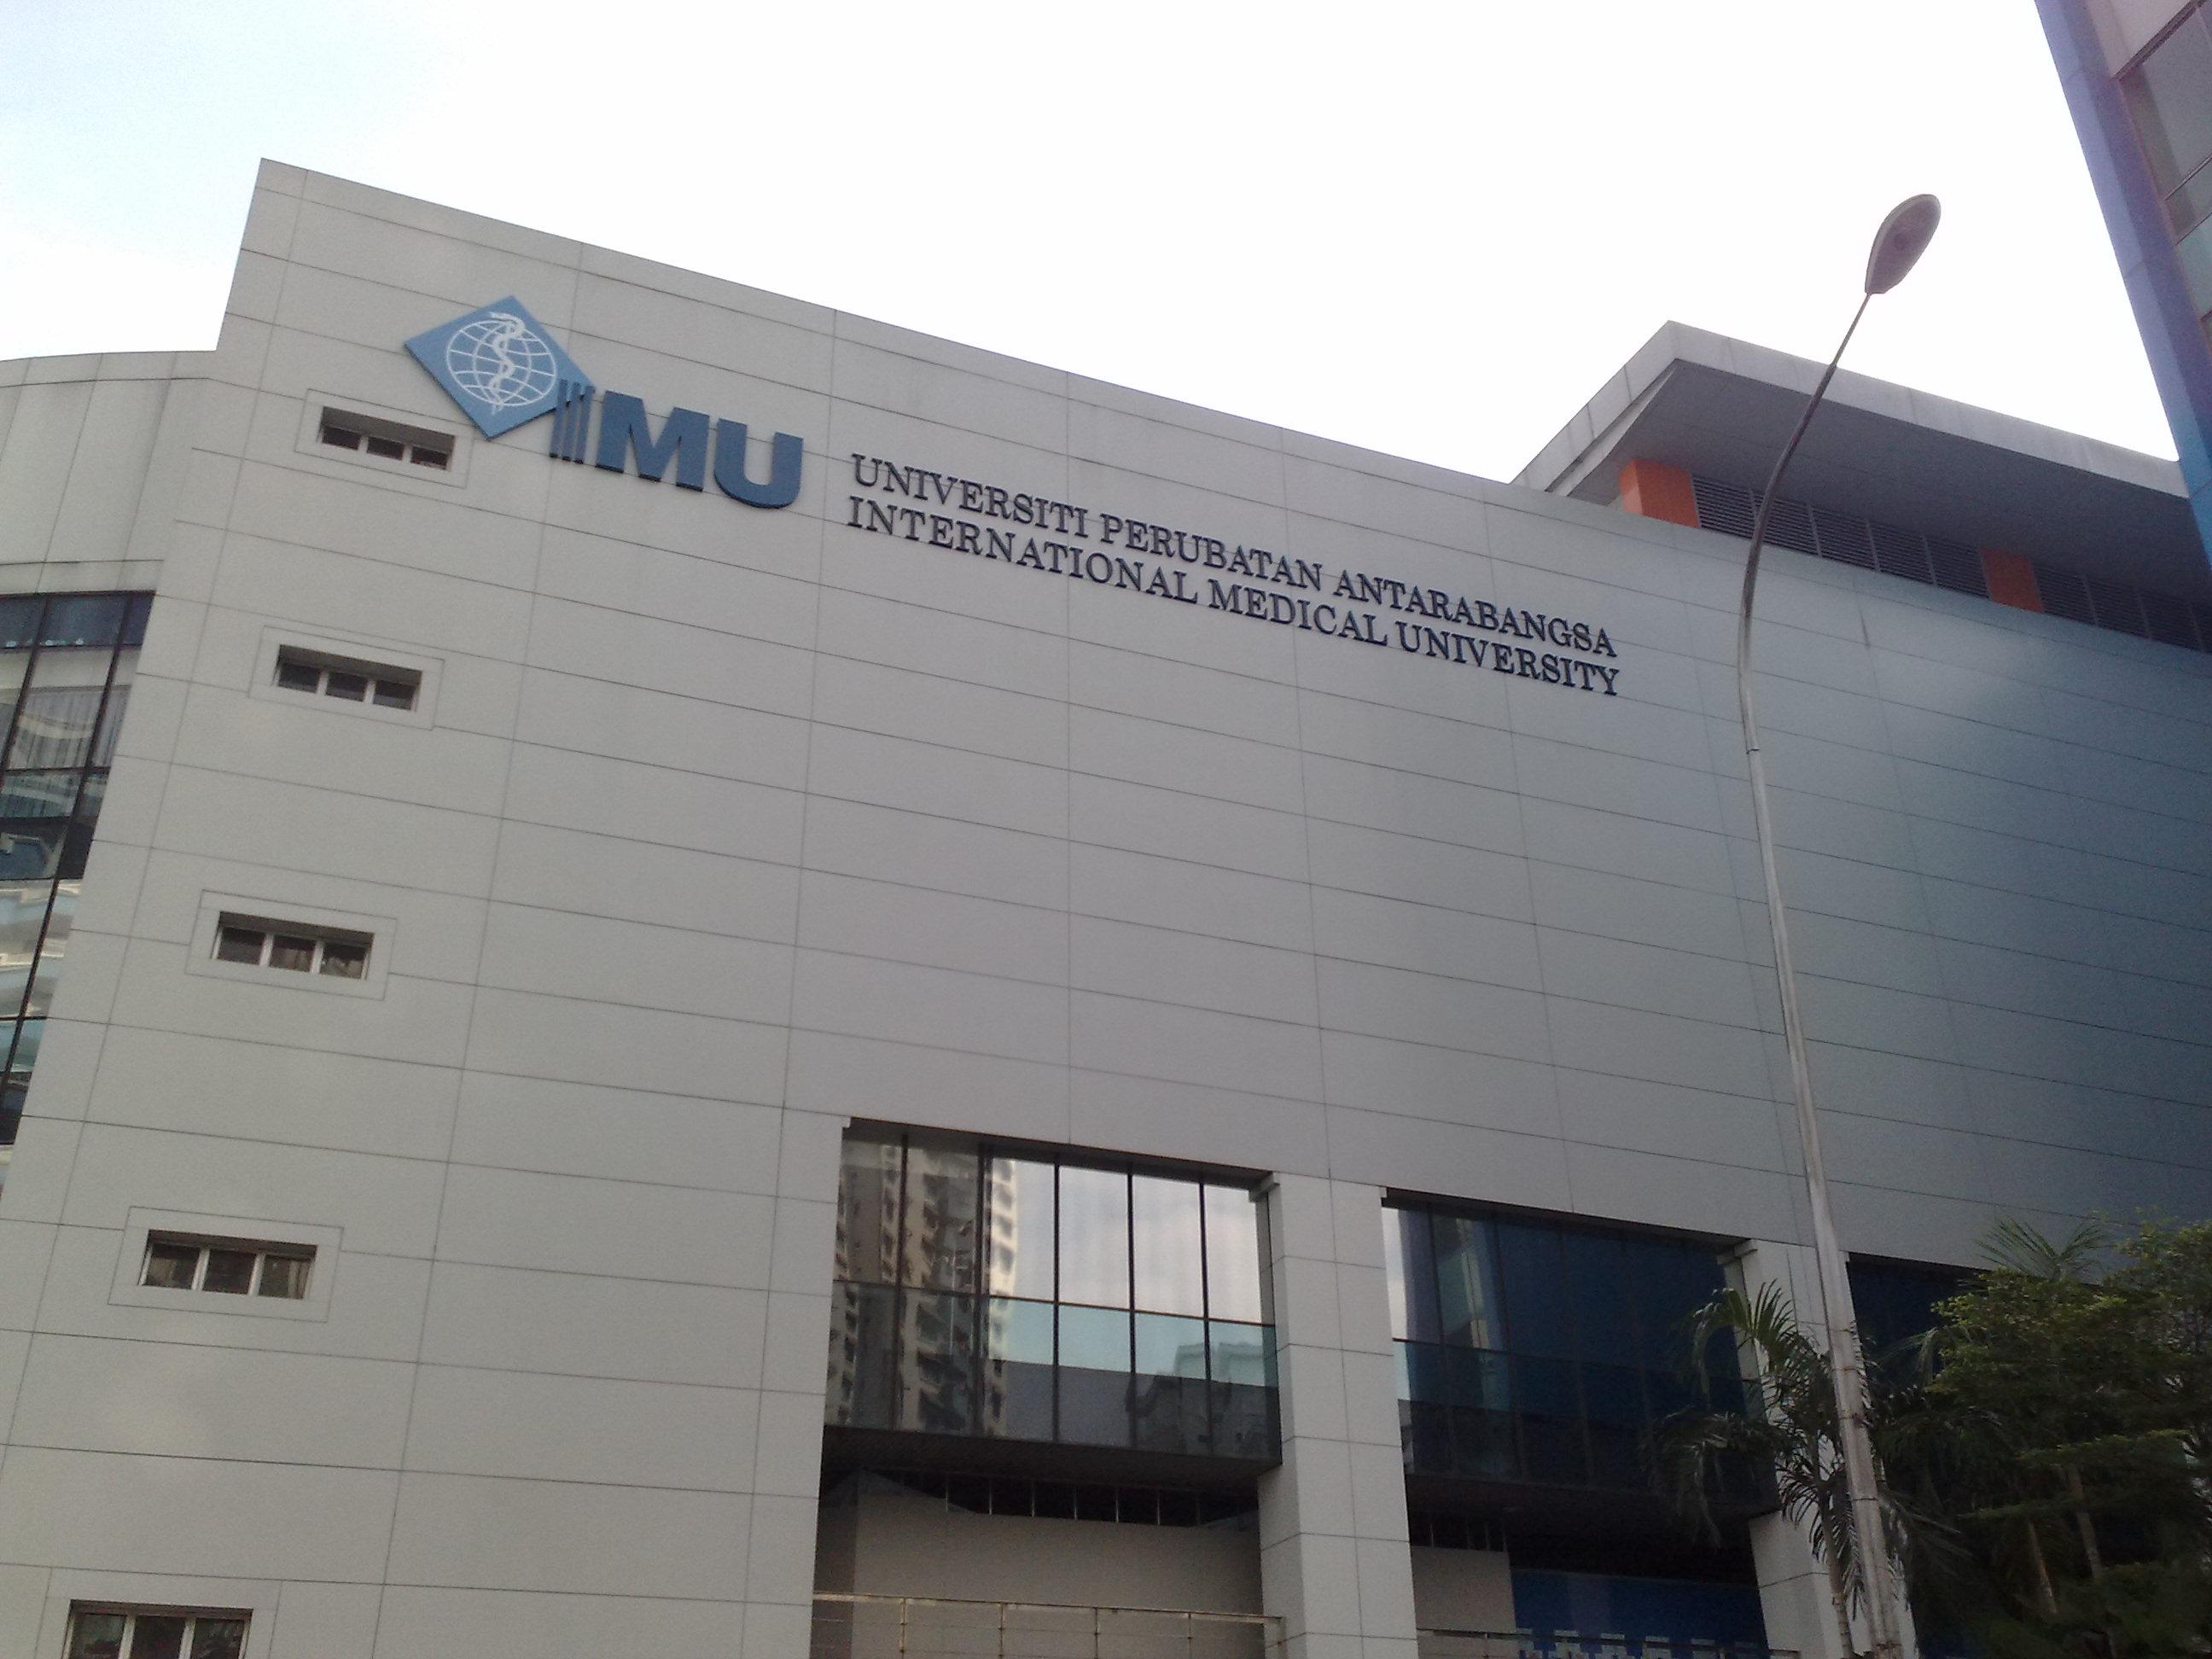 File The International Medical University Bukit Jalil Campus Main Building In 2009 Jpg Wikipedia